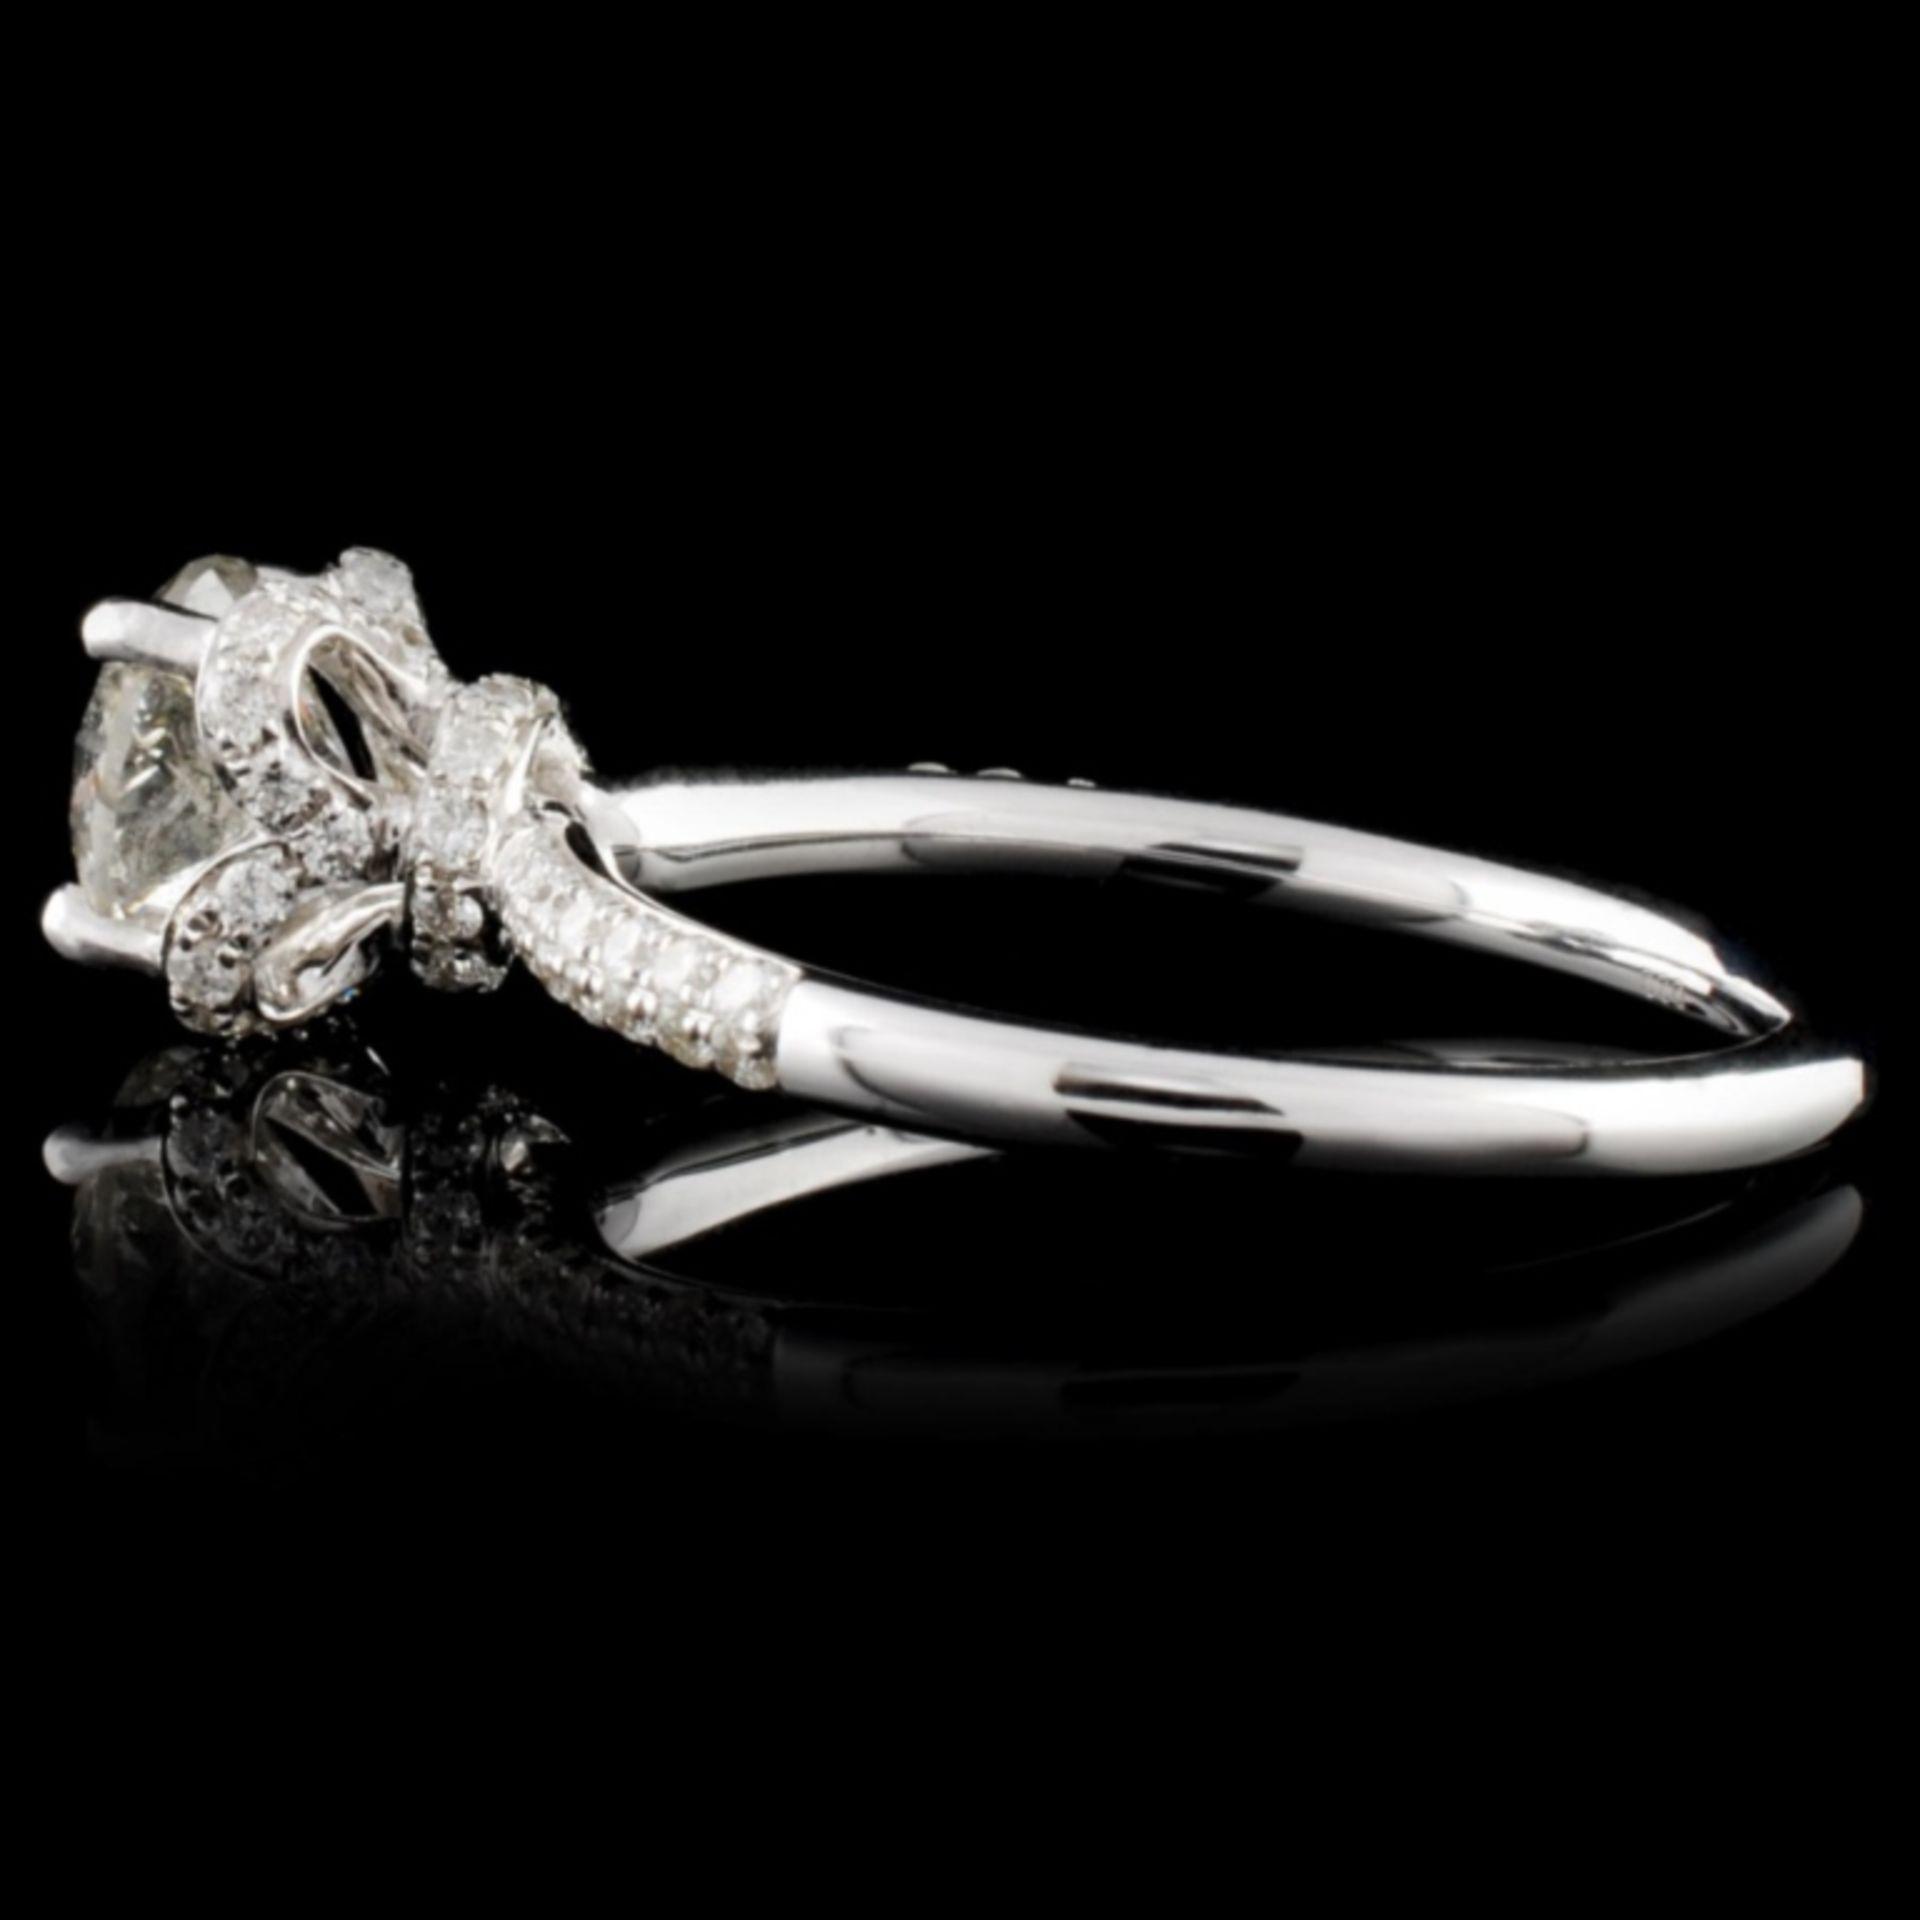 18K White Gold 1.58ctw Diamond Ring - Image 3 of 4